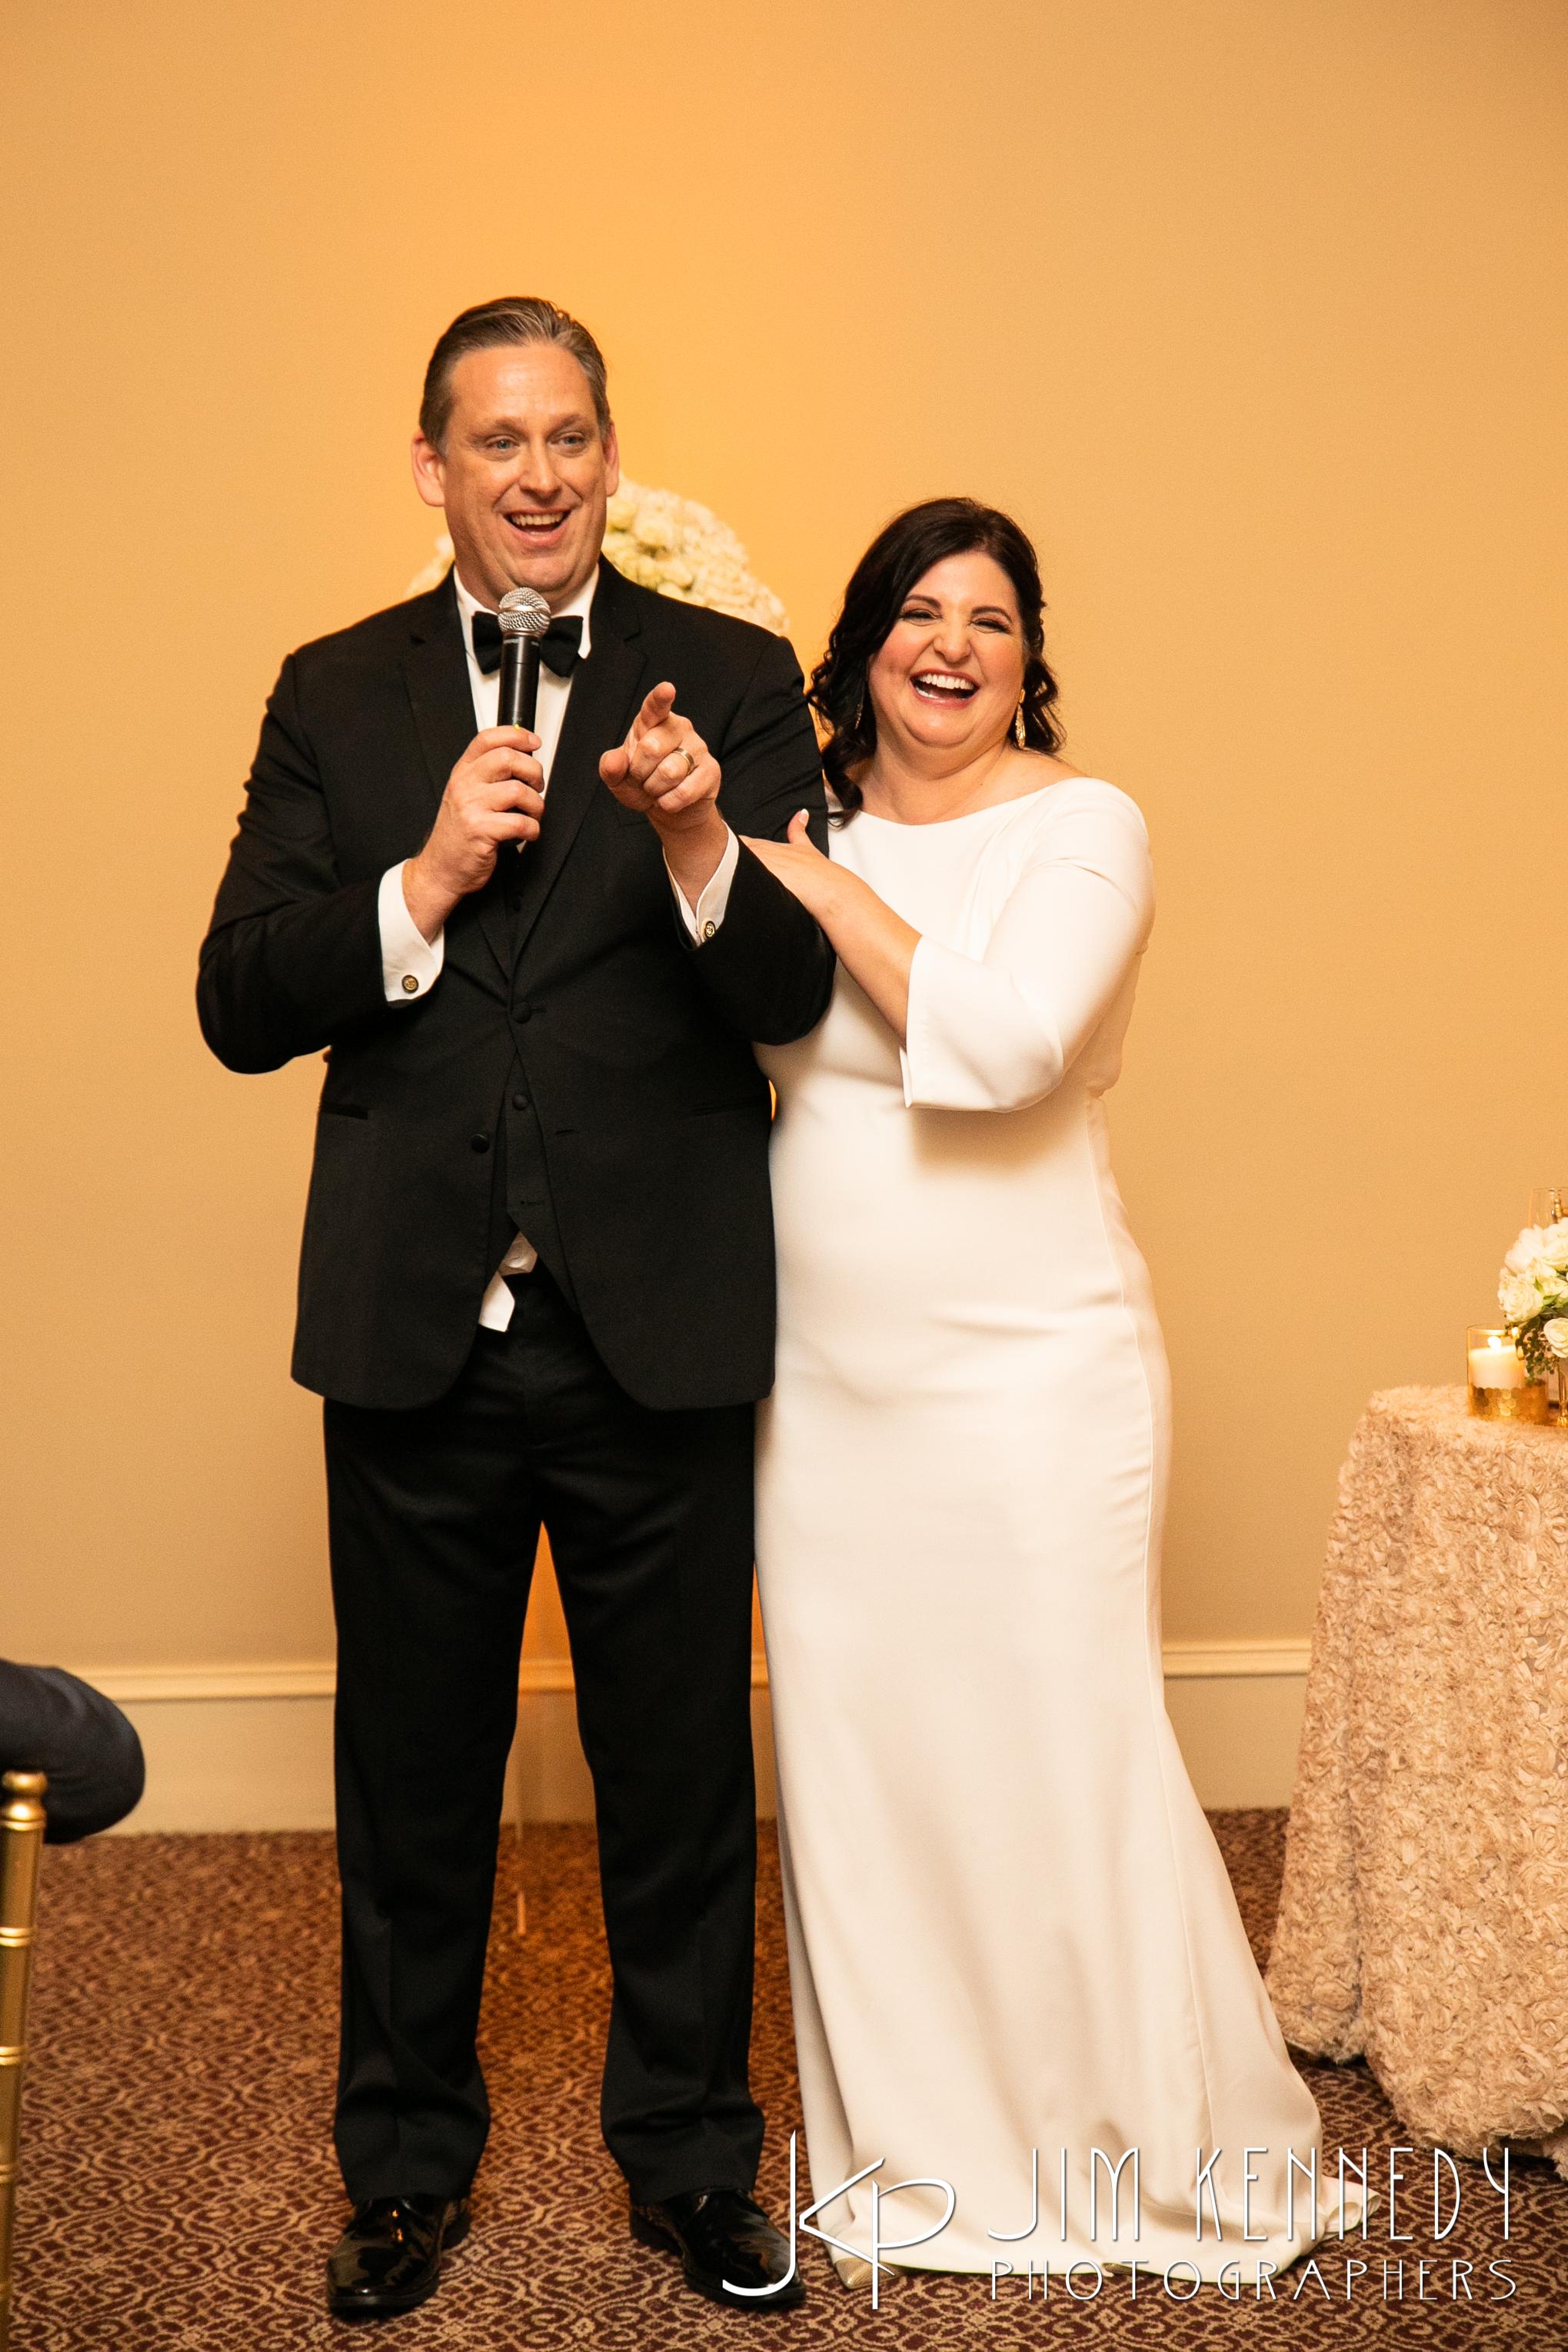 sherwood_country_club_wedding-3596.jpg